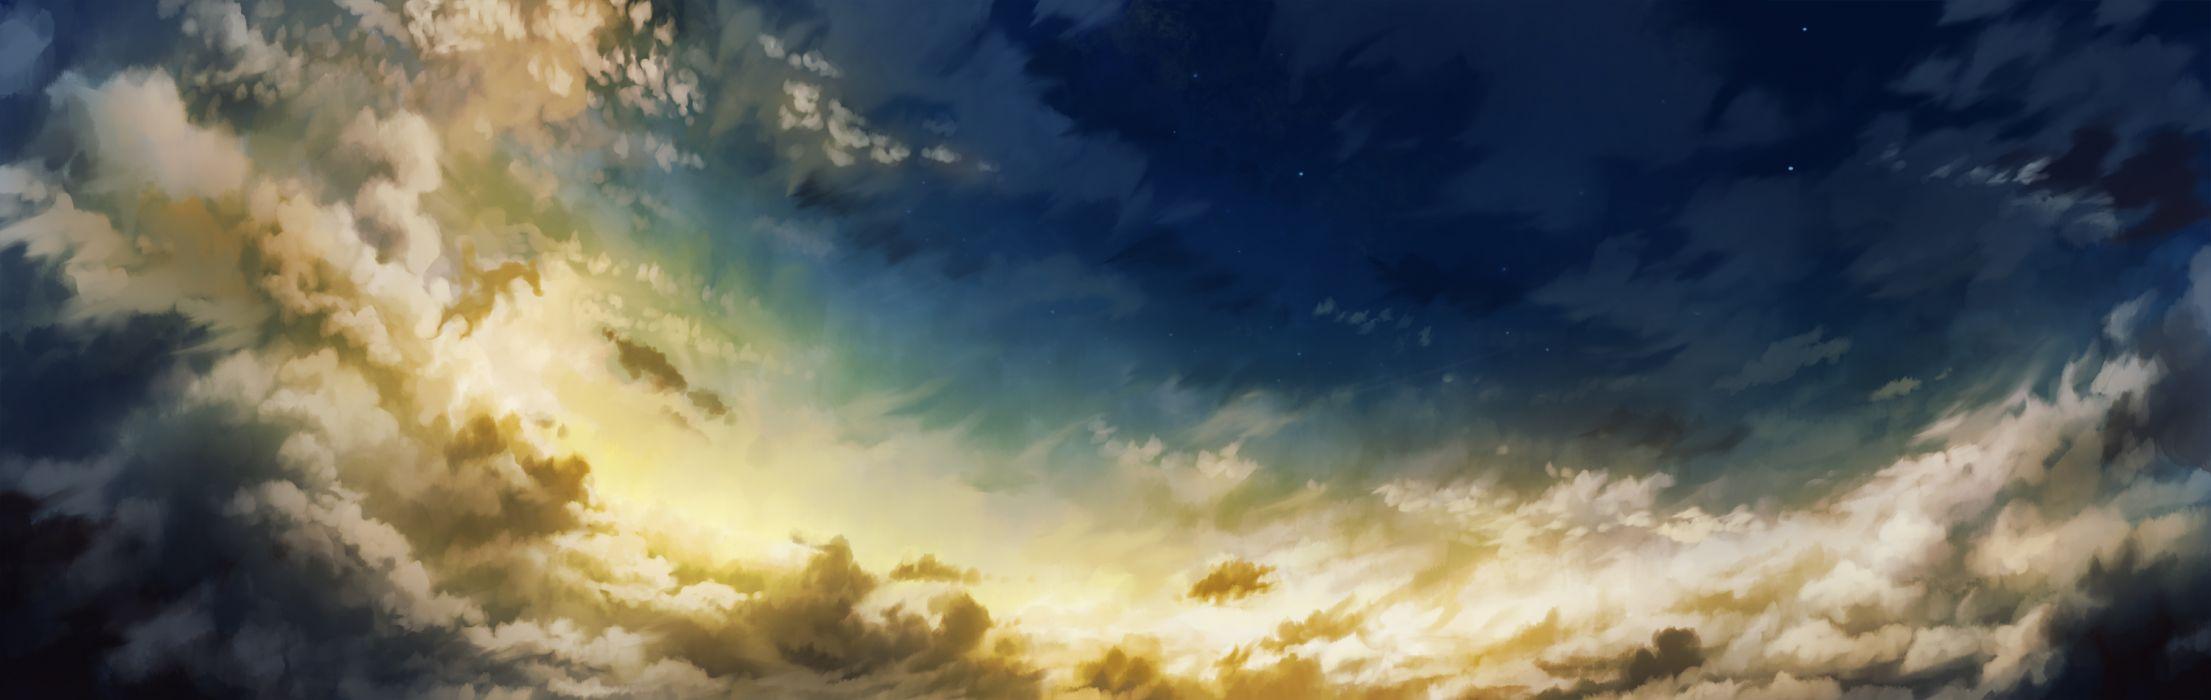 original clouds dualscreen hatsuga (dmaigmai) original scenic sky stars wallpaper